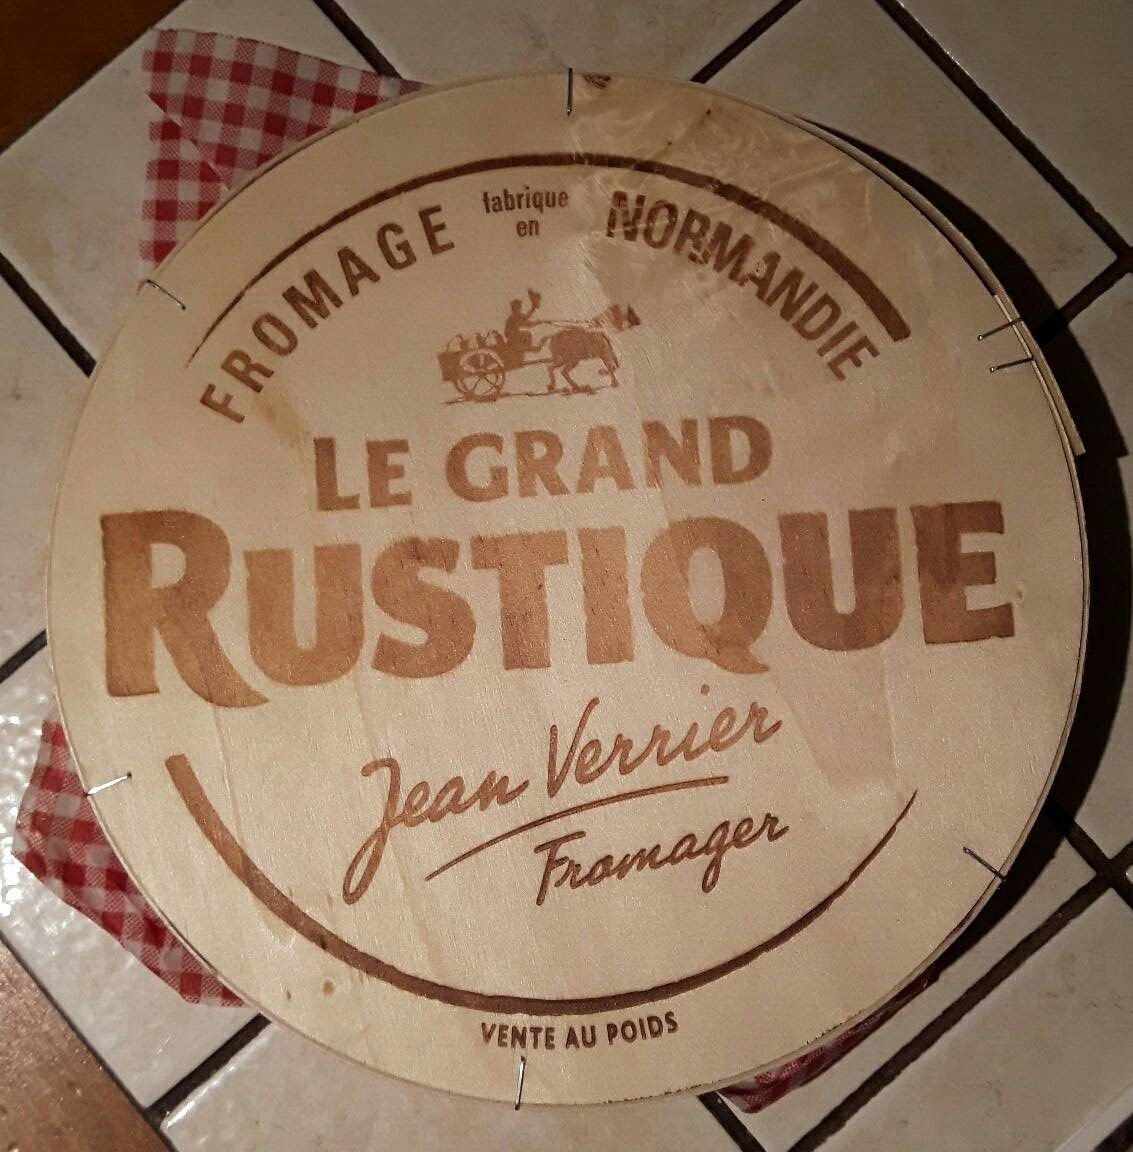 le grand rustique - Ingrediënten - fr